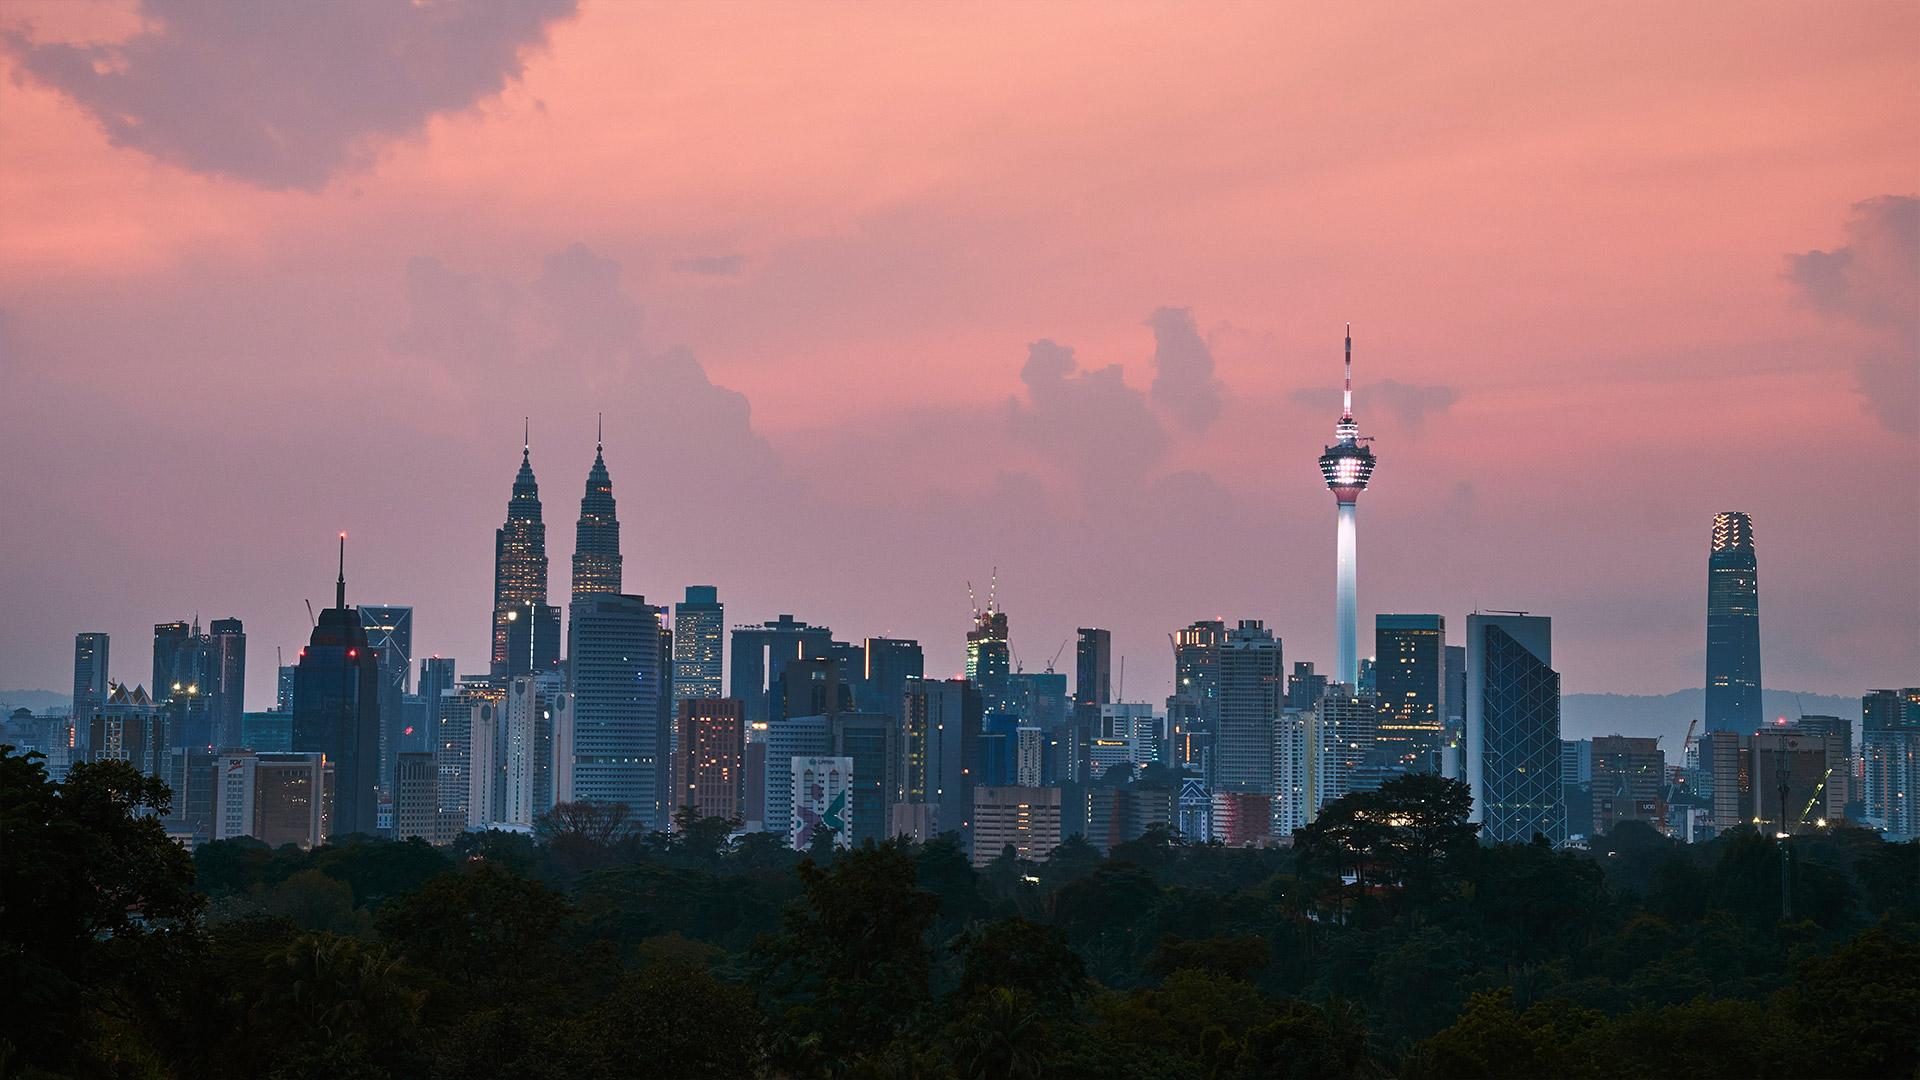 Contact Atrax: Kuala Lumpur, Malaysia | CK Yeo, unsplash | 1920x1080